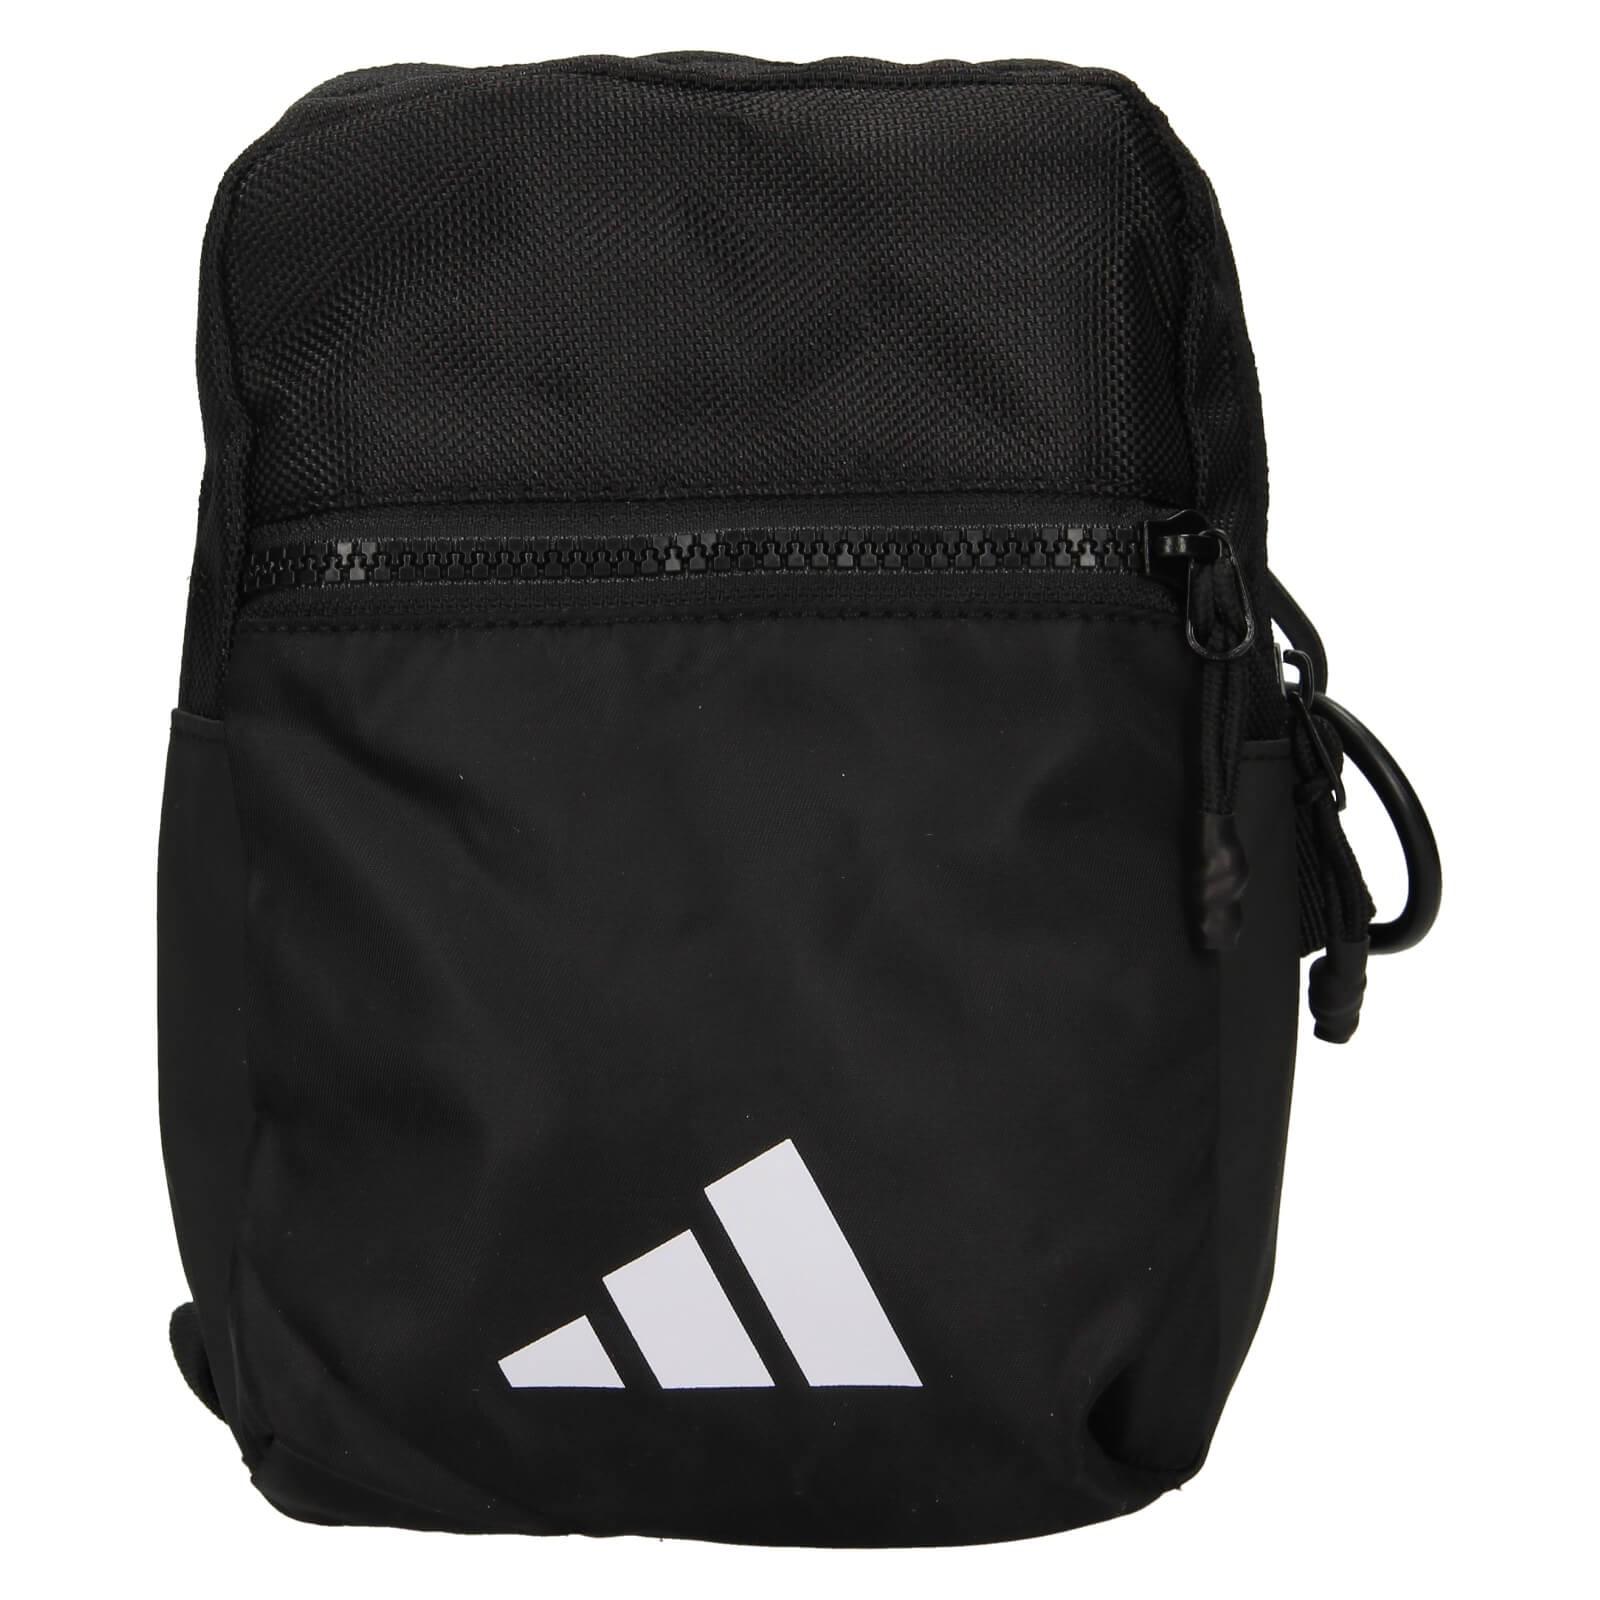 Taška přes rameno Adidas Chris - černá